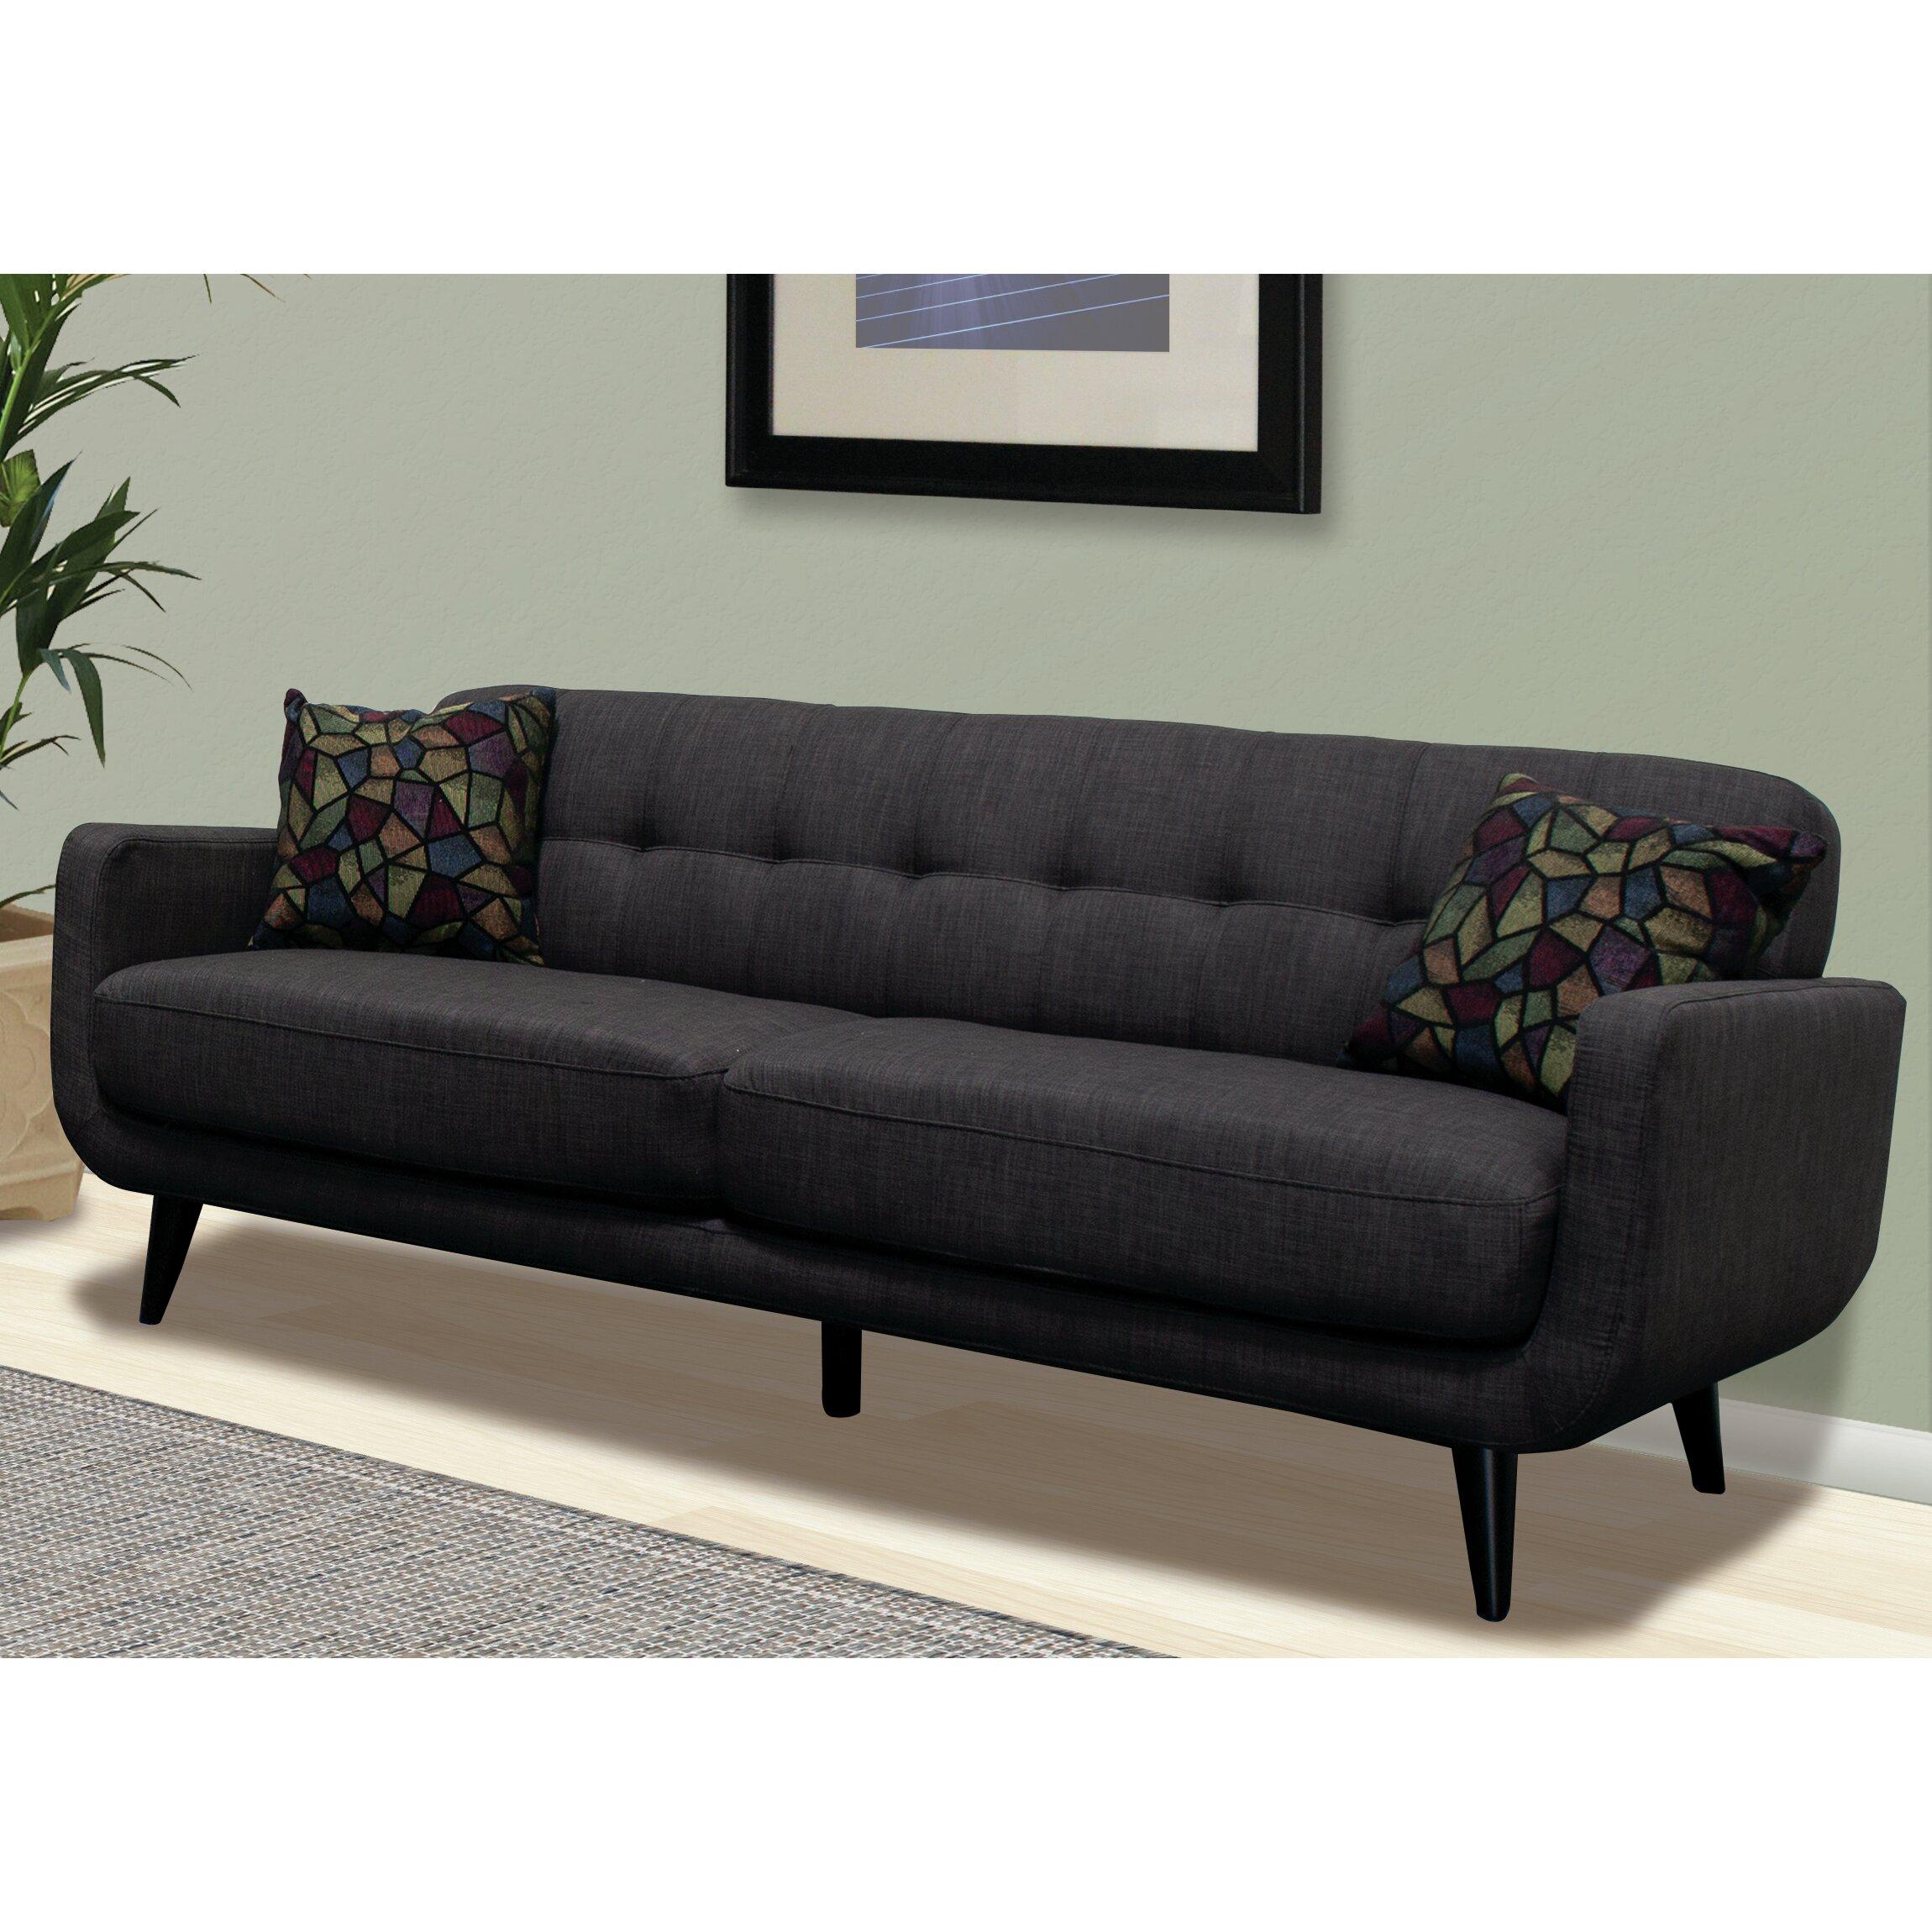 Sofa And Loveseat Set Wayfair